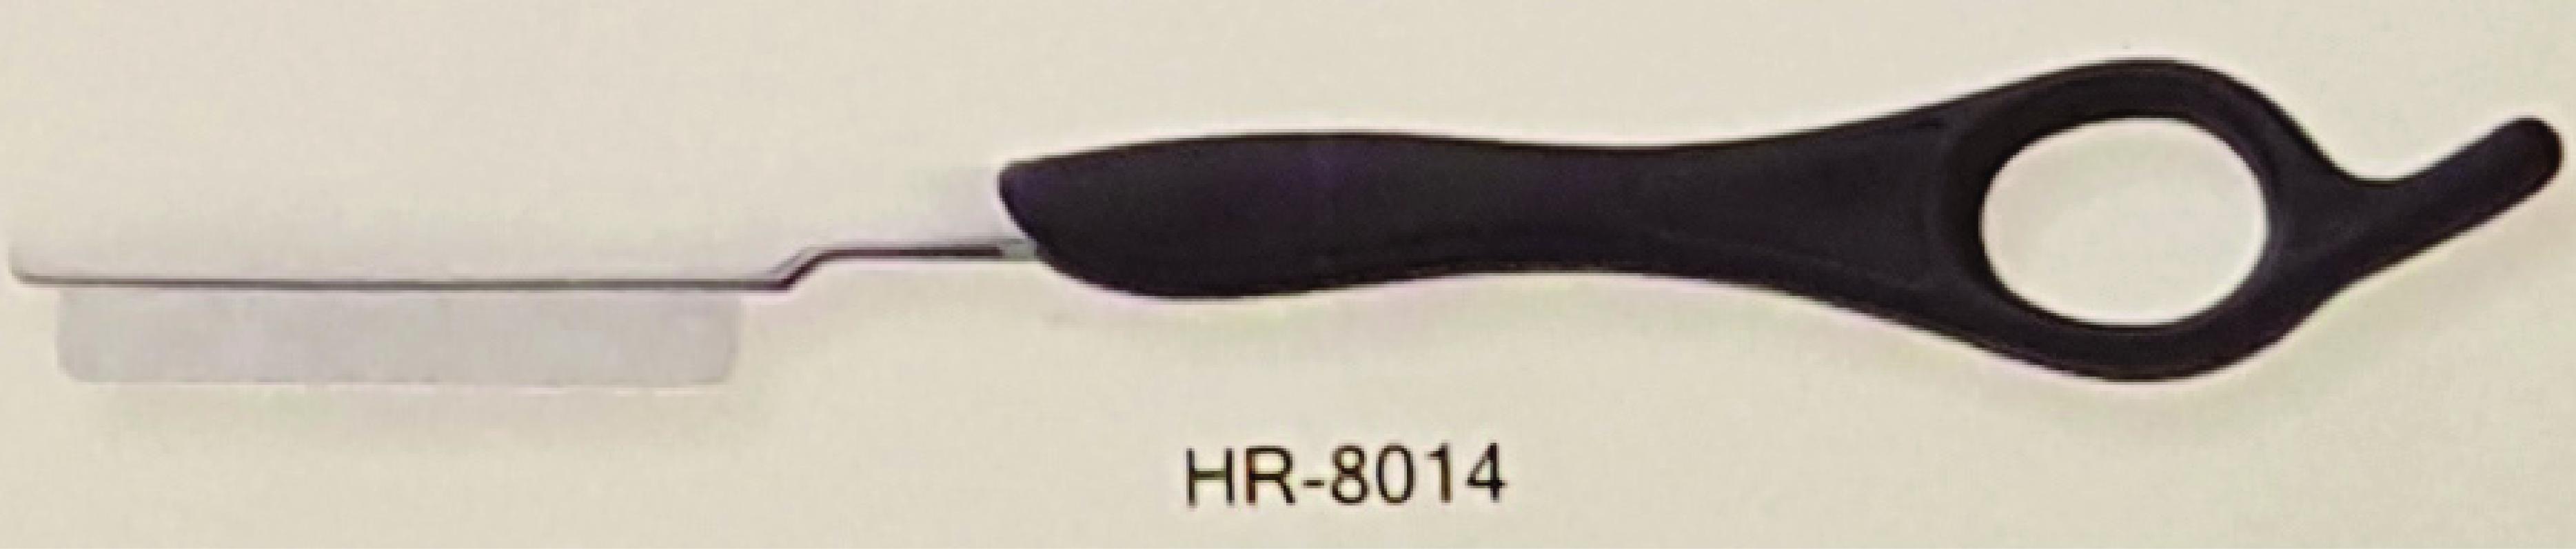 HR-8014